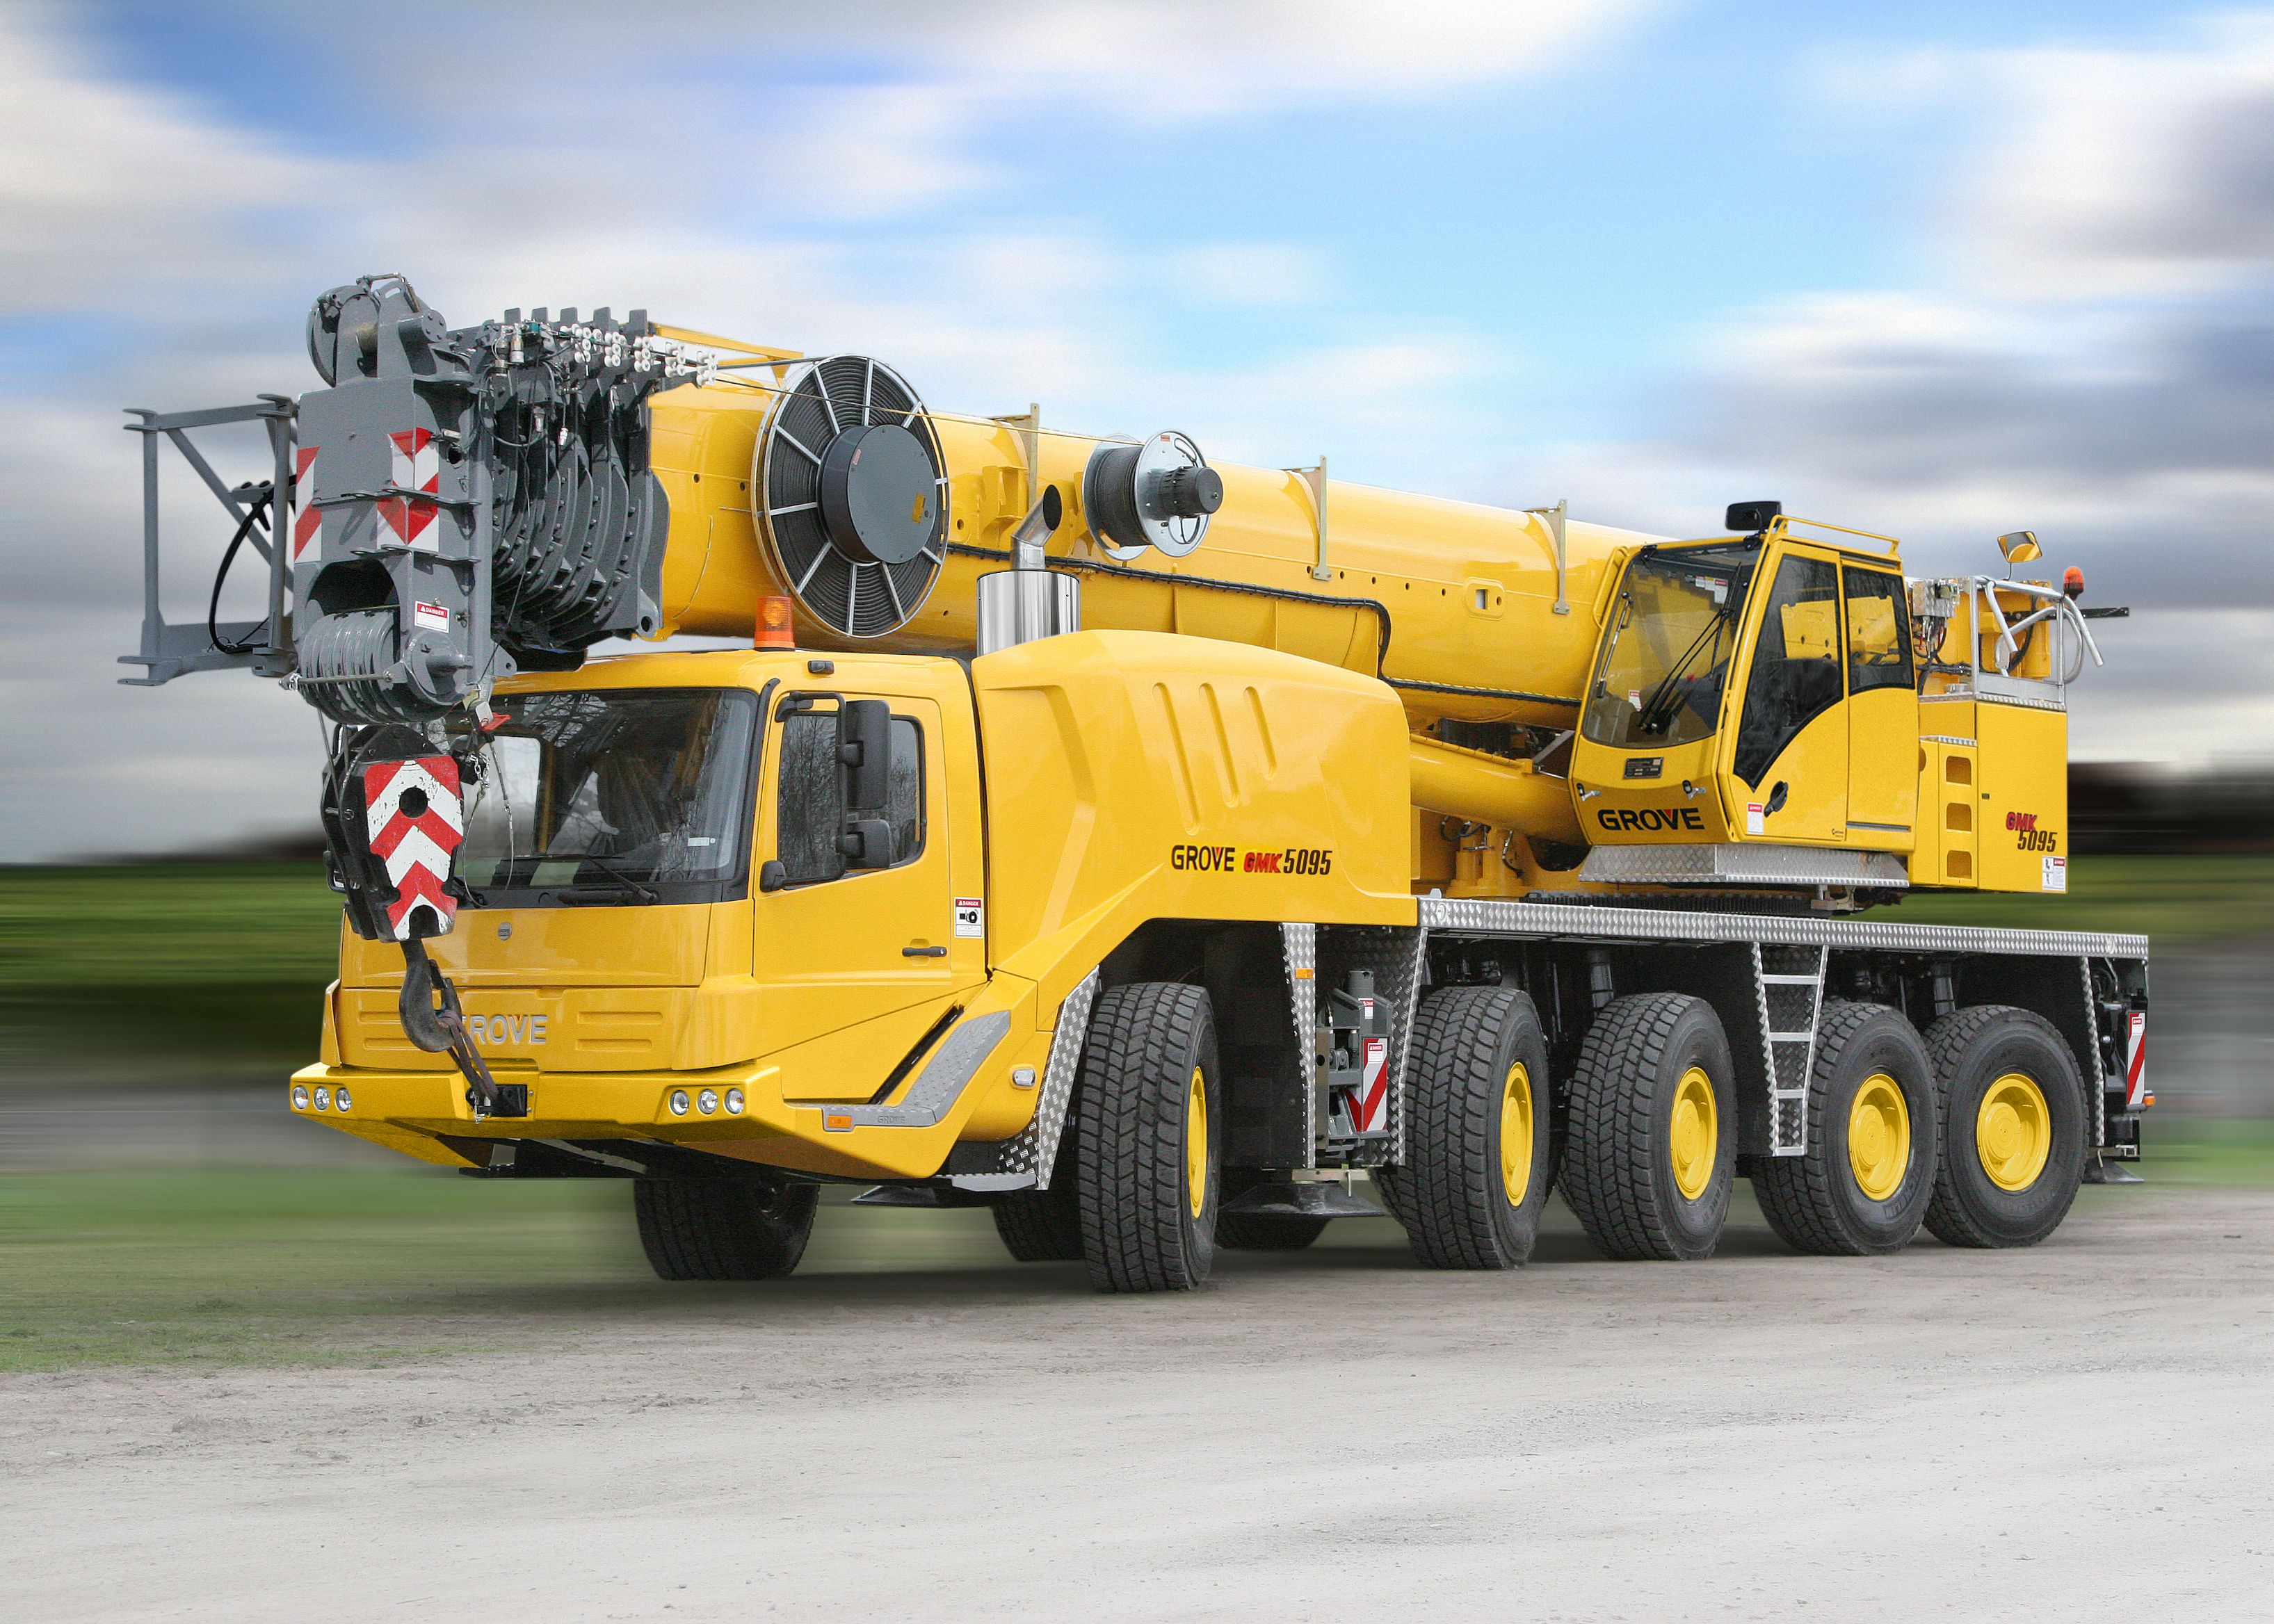 Mobile Crane Pictures : Grove all terrain mobile crane proiecte de ?ncercat